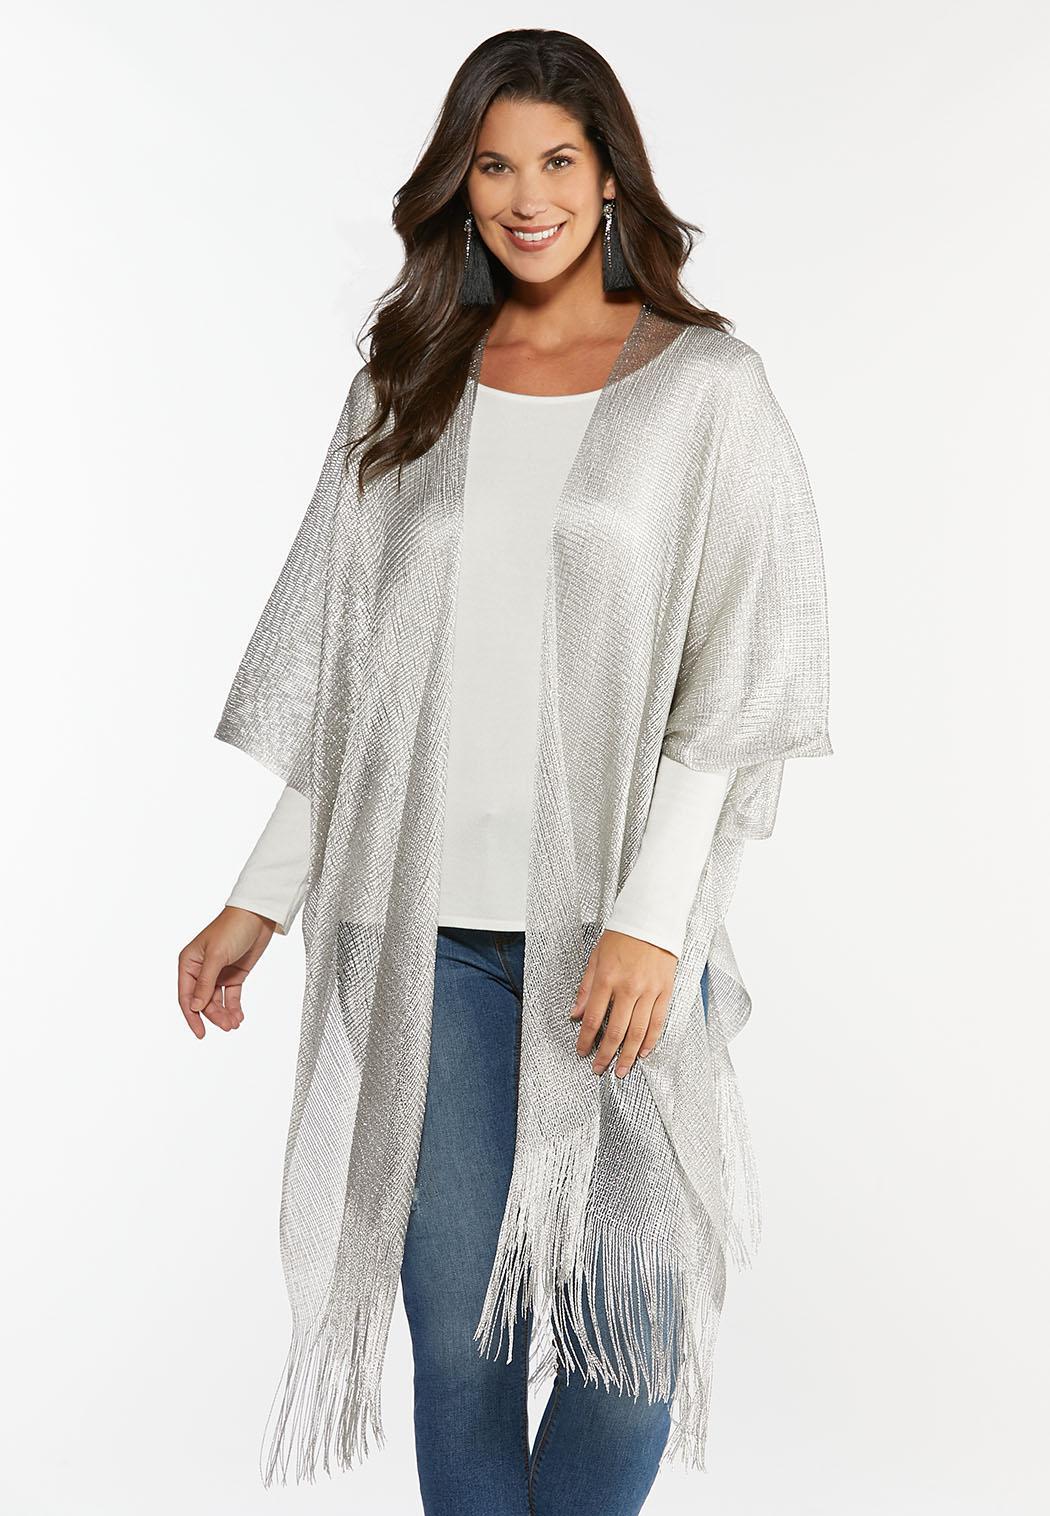 Shimmery Silver Kimono